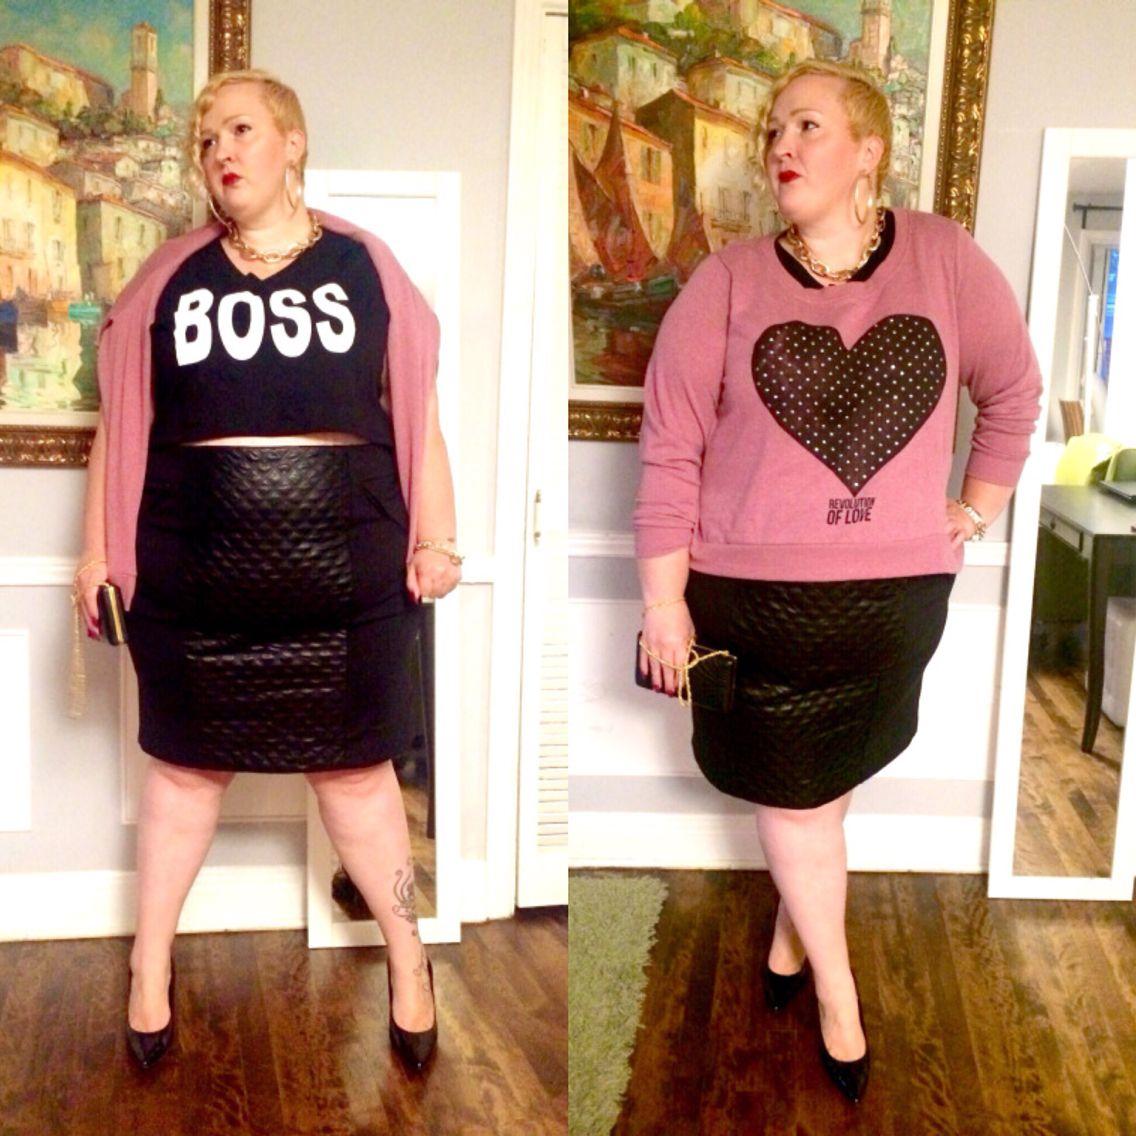 WWW.FLIGHTOFTHEFATGIRL.COM  Rebdolls BOSS crop top, Penningtons skirt, Addition Elle heart sweater.   Plus size fashion.